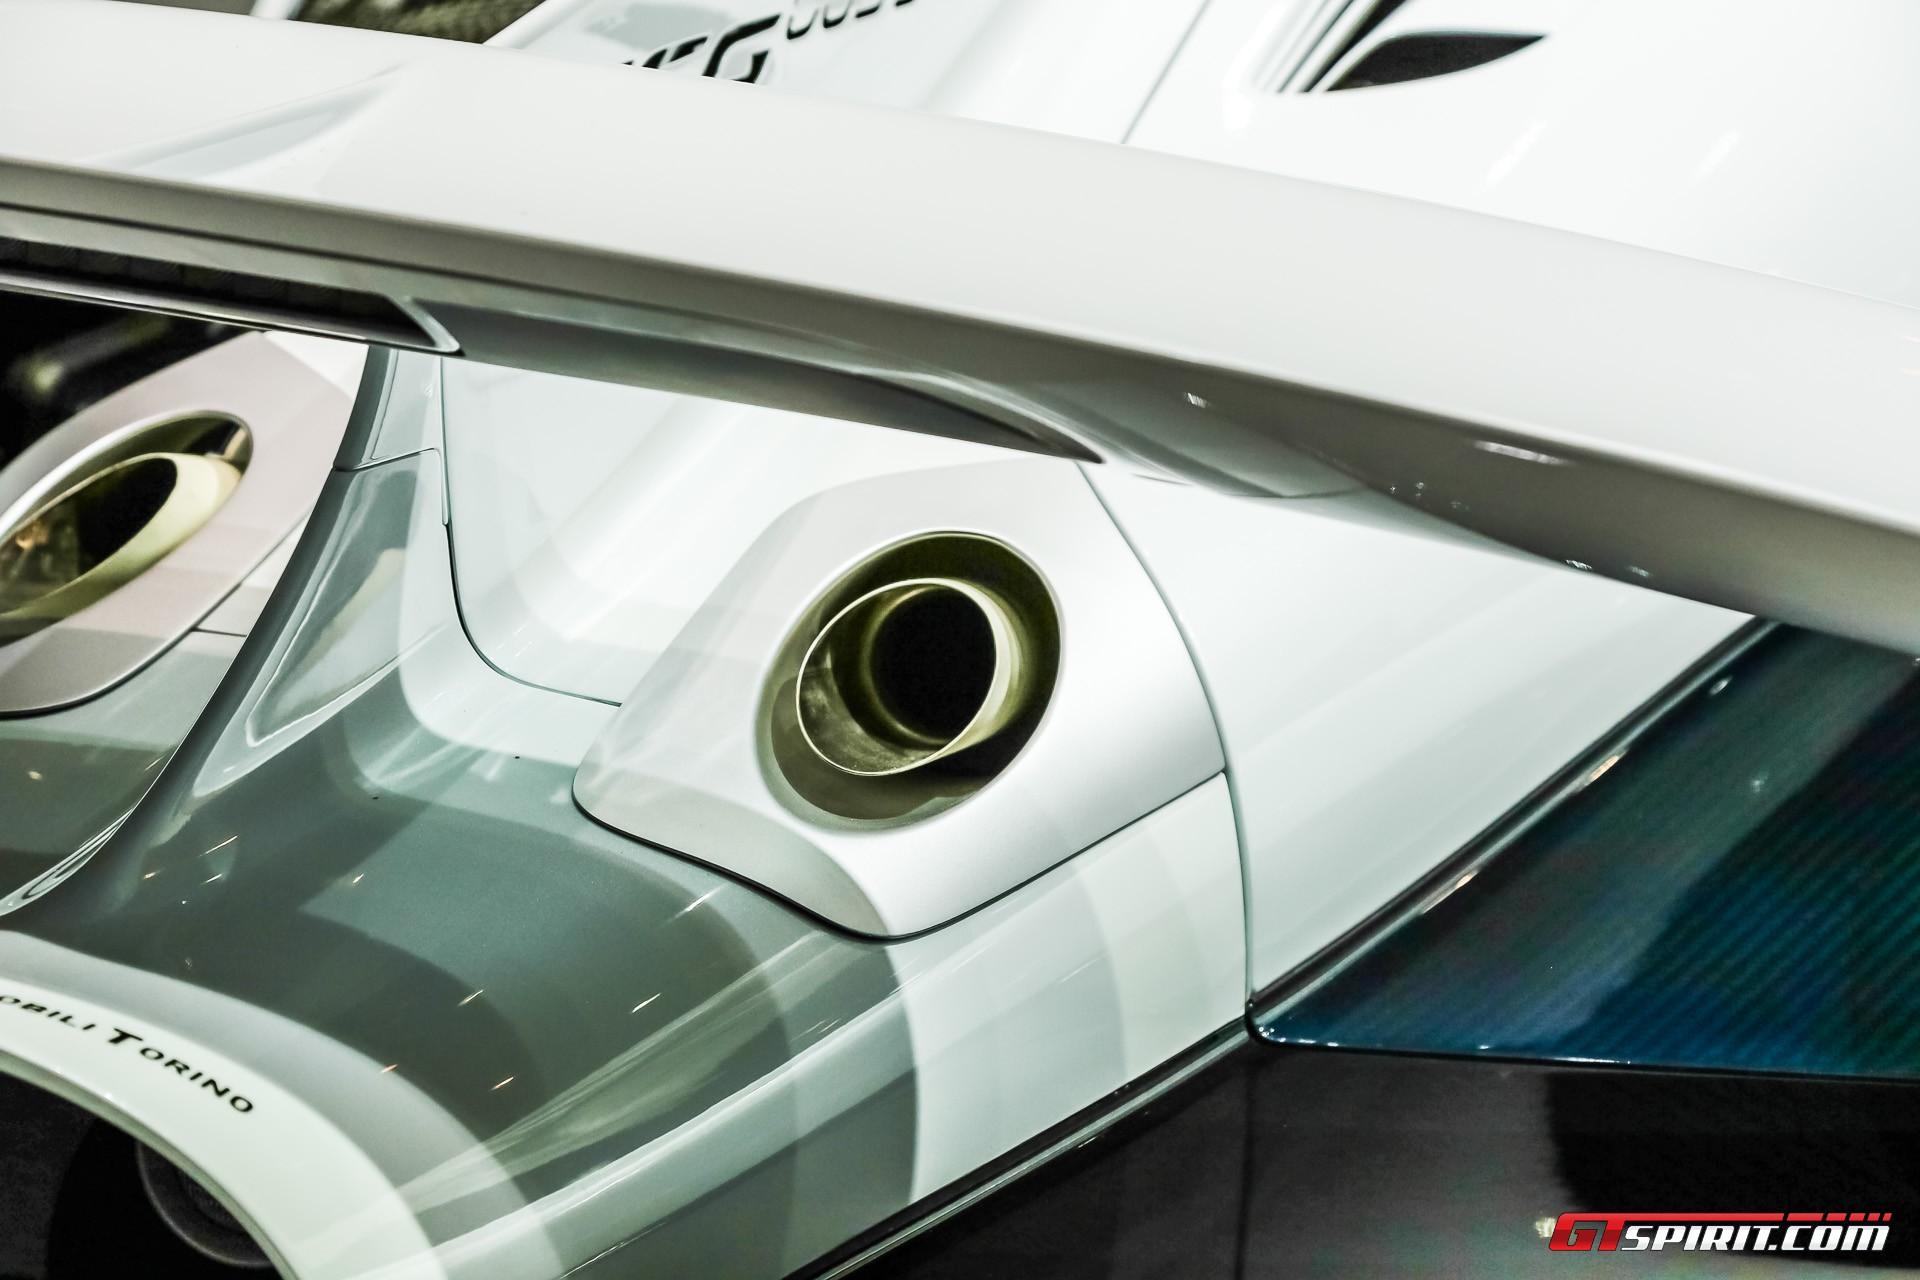 Geneva 2017 Scuderia Cameron Glickenhaus SCG003S GTspirit